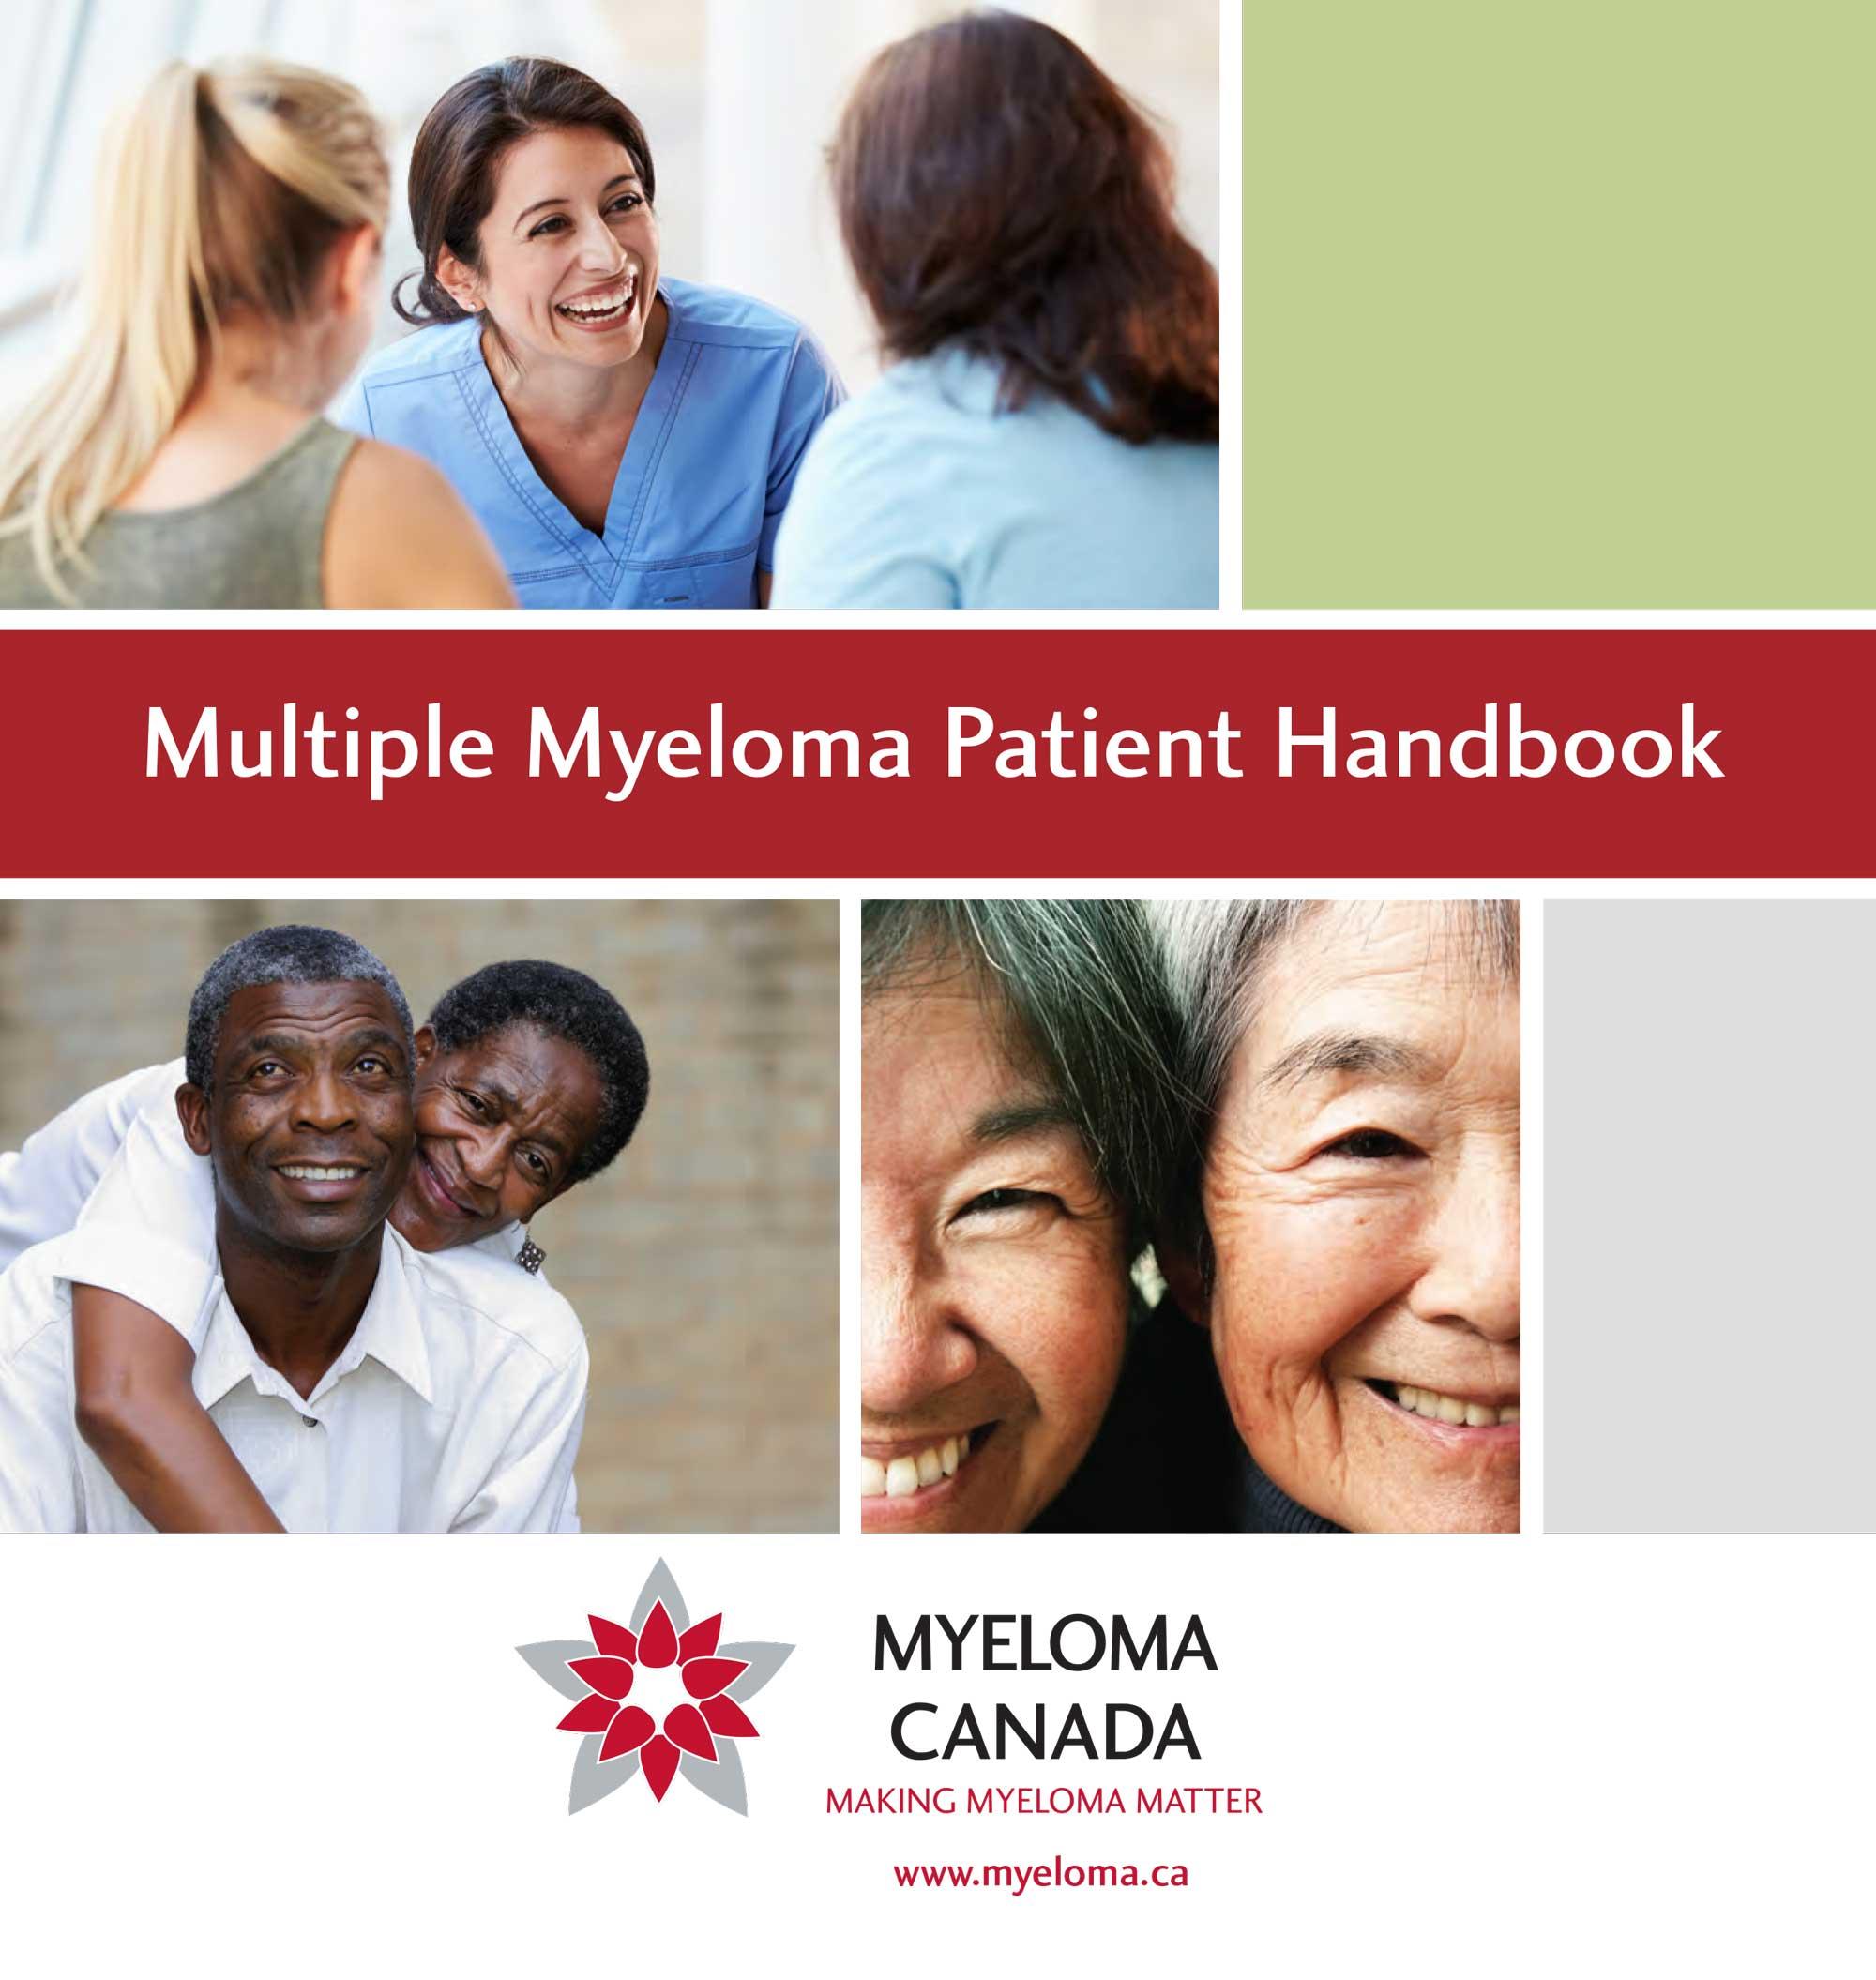 Myeloma Patient Handbook